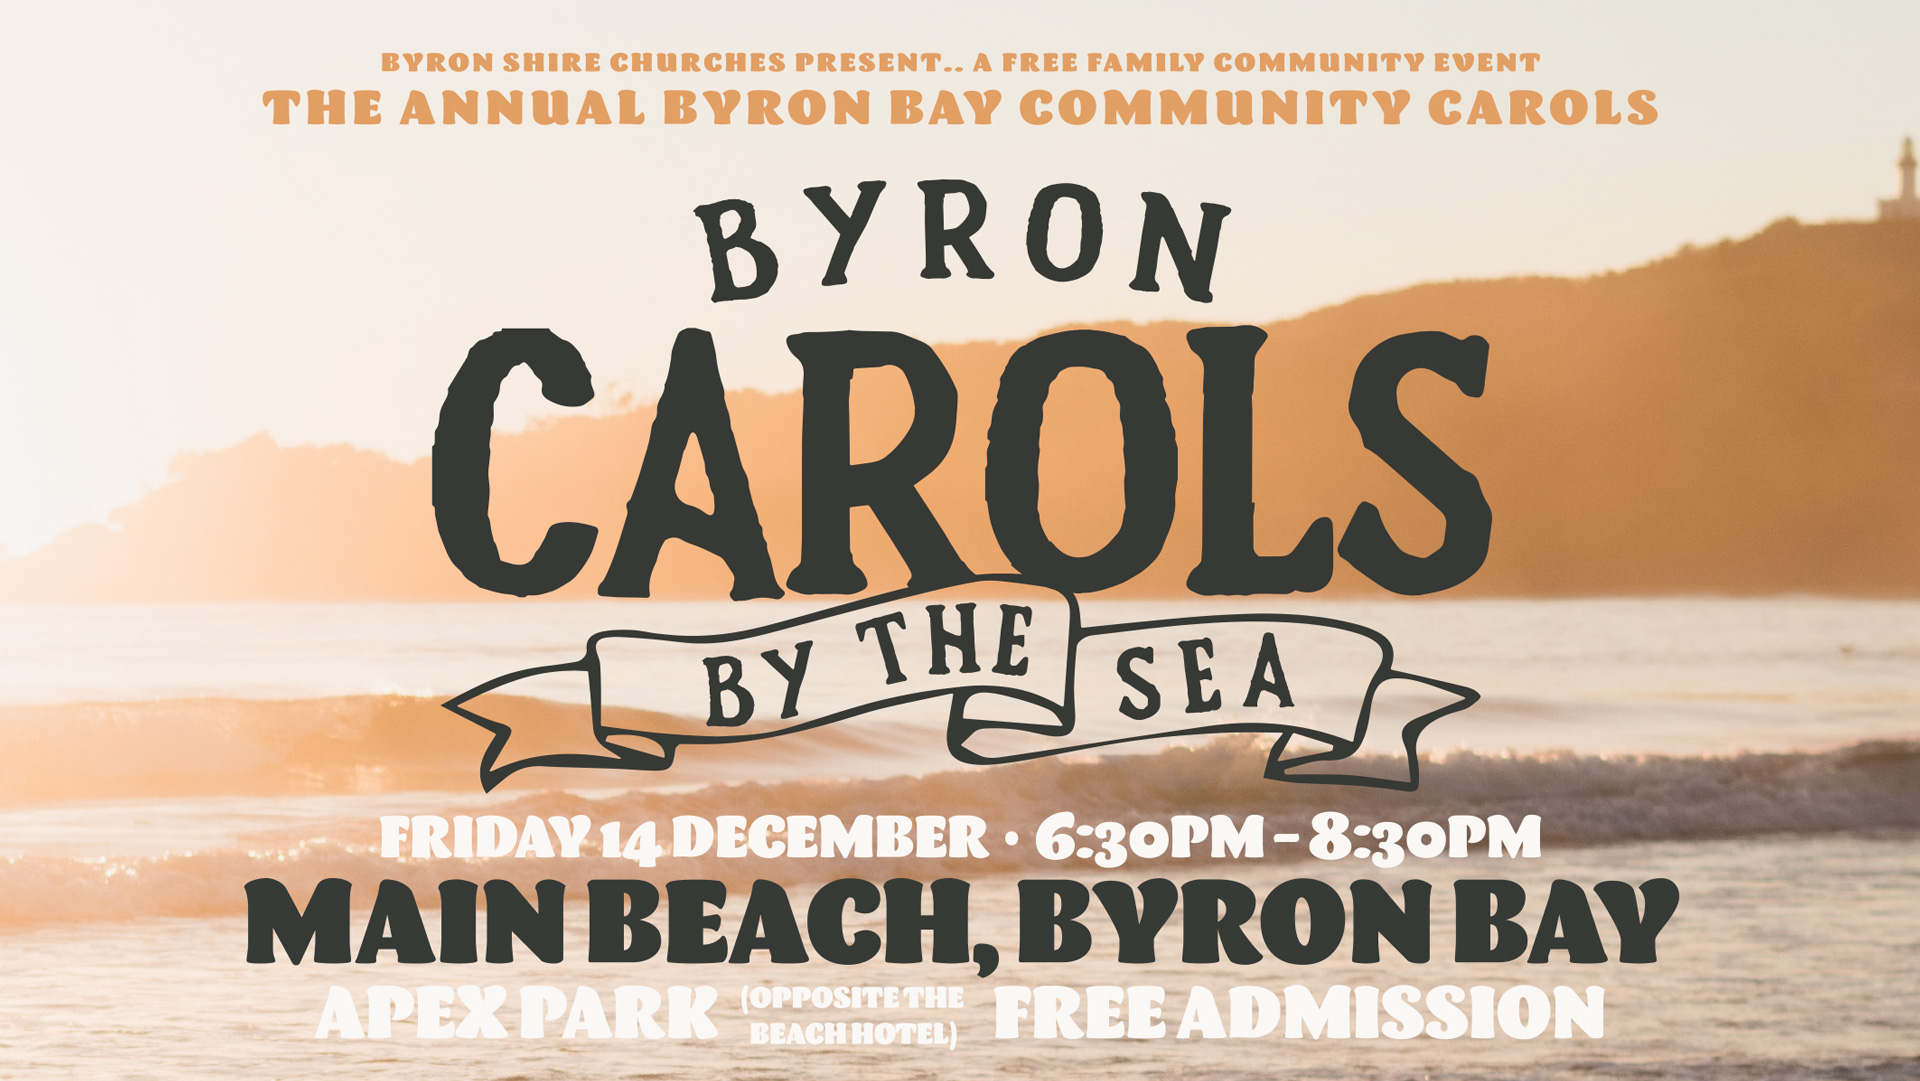 Byron-Carols-Widescreen-HD.jpg